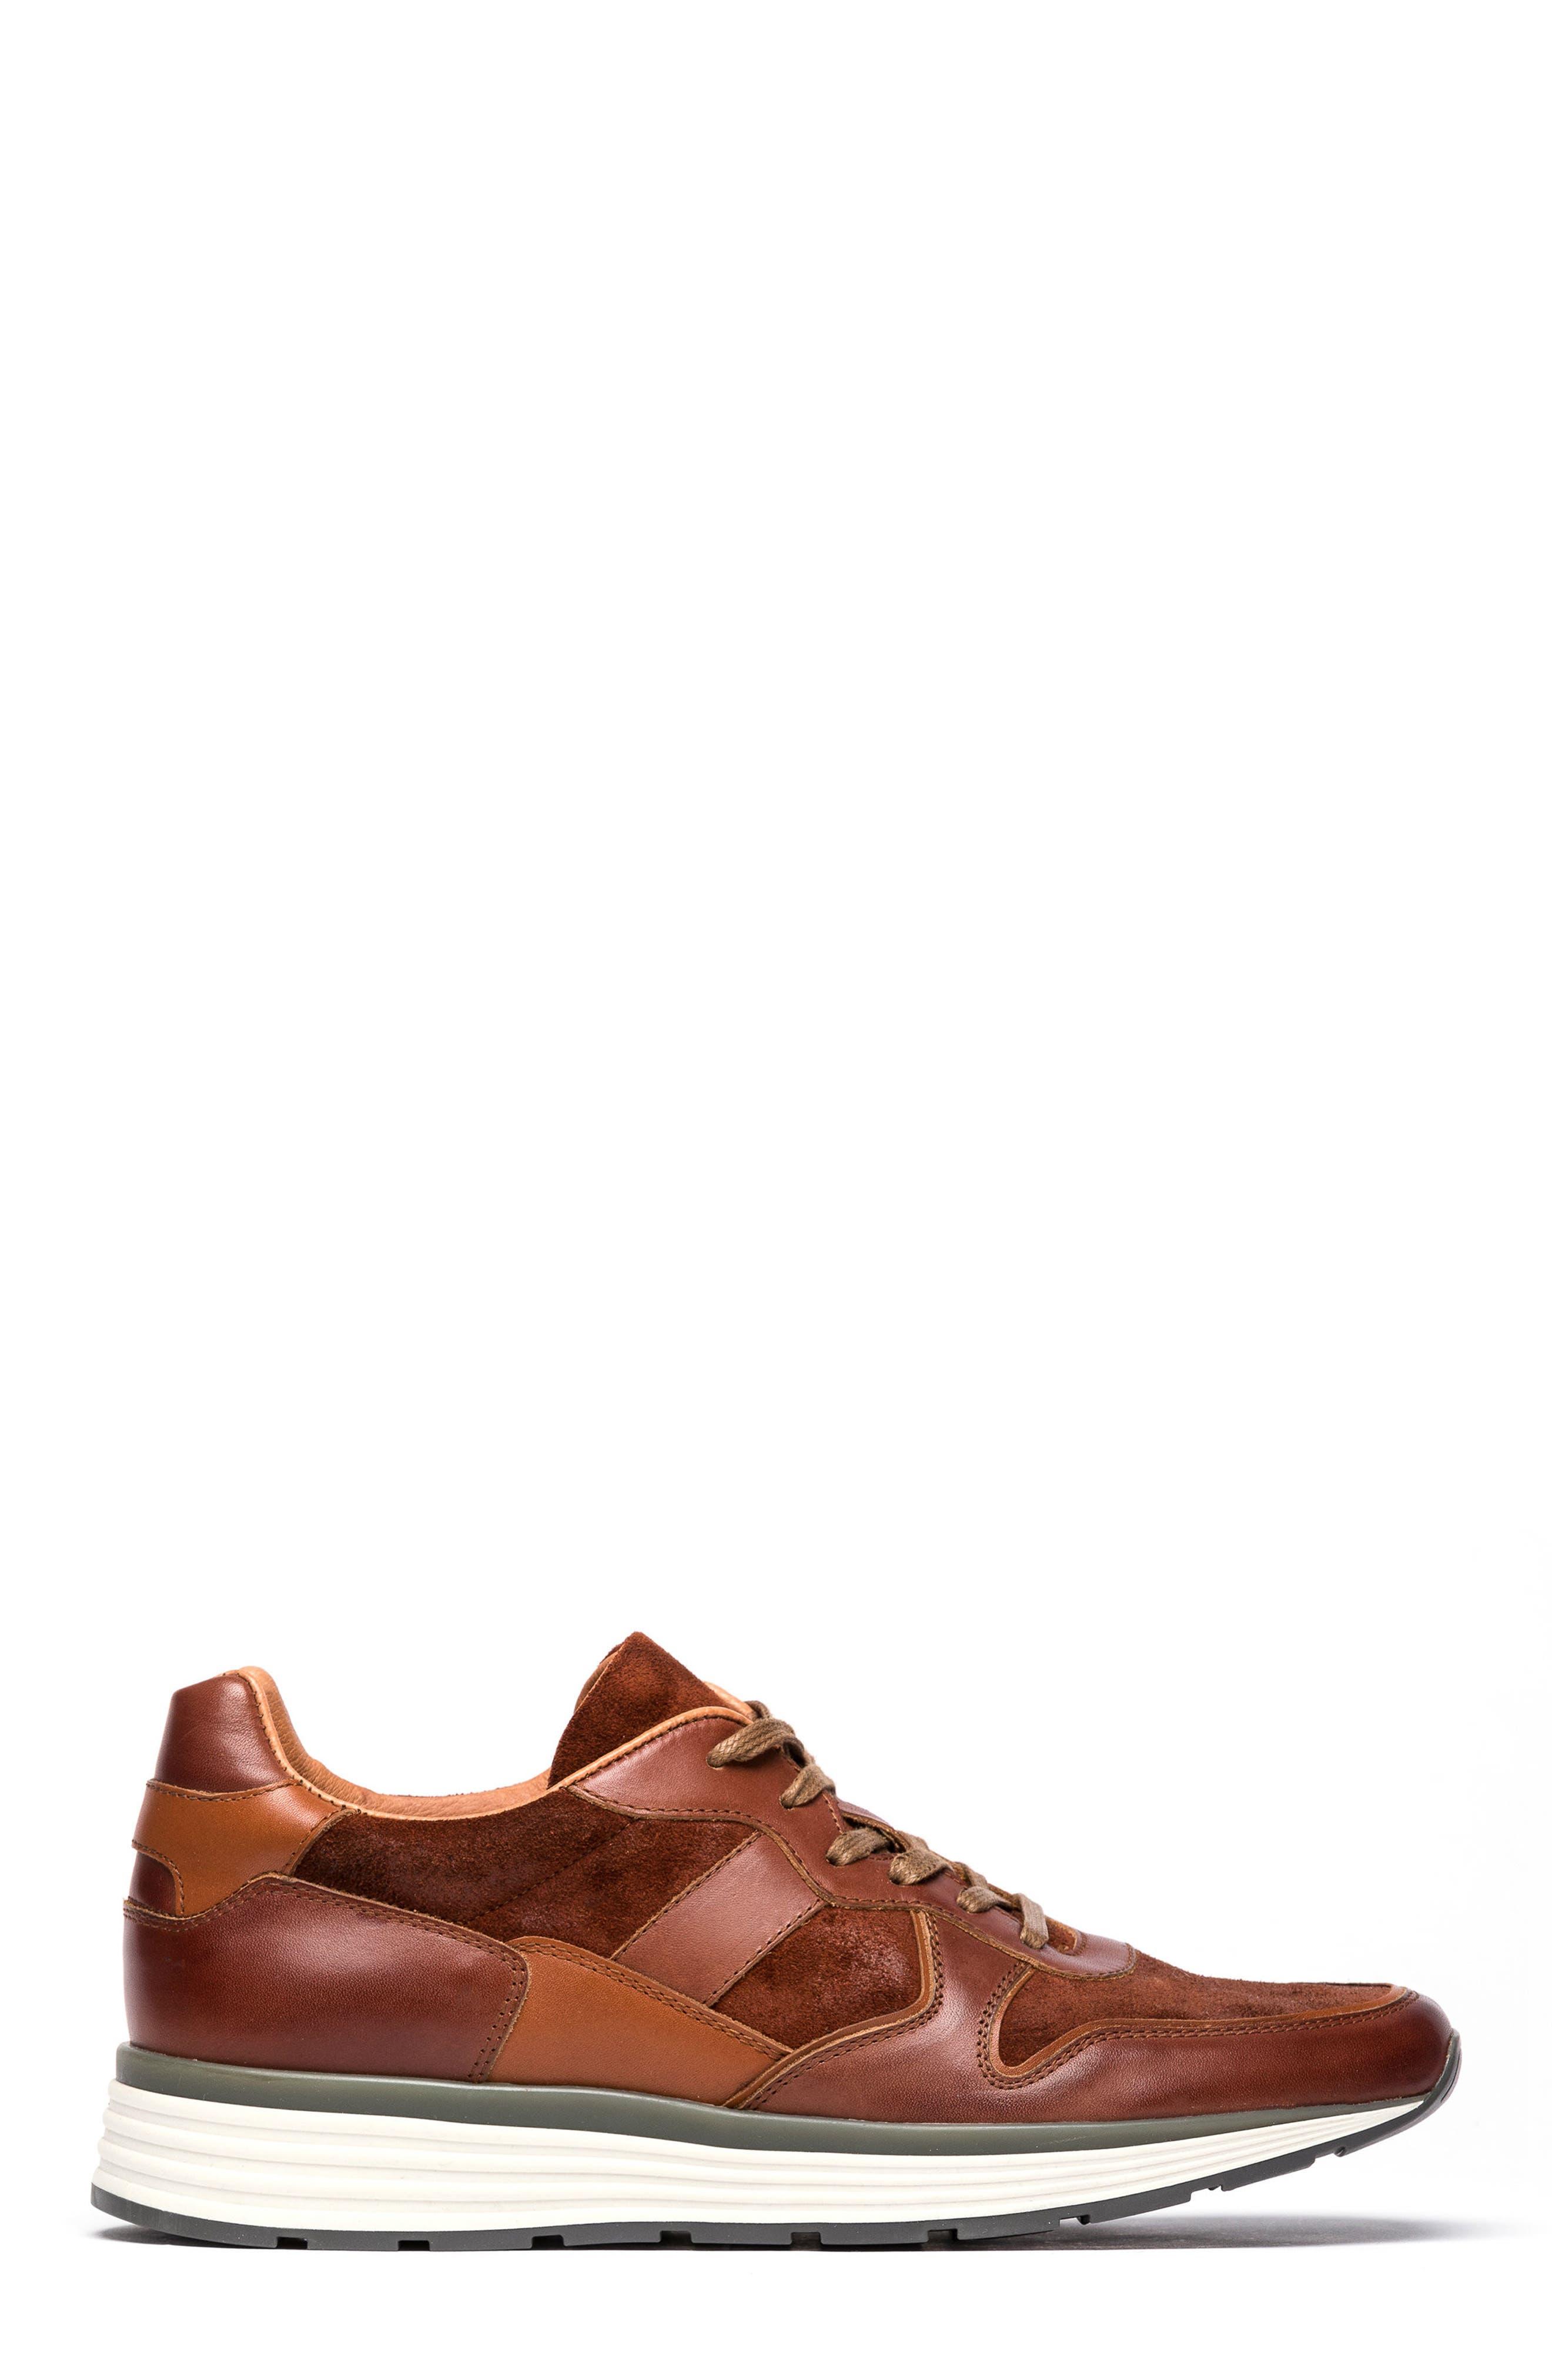 Hickory Sneaker,                             Alternate thumbnail 5, color,